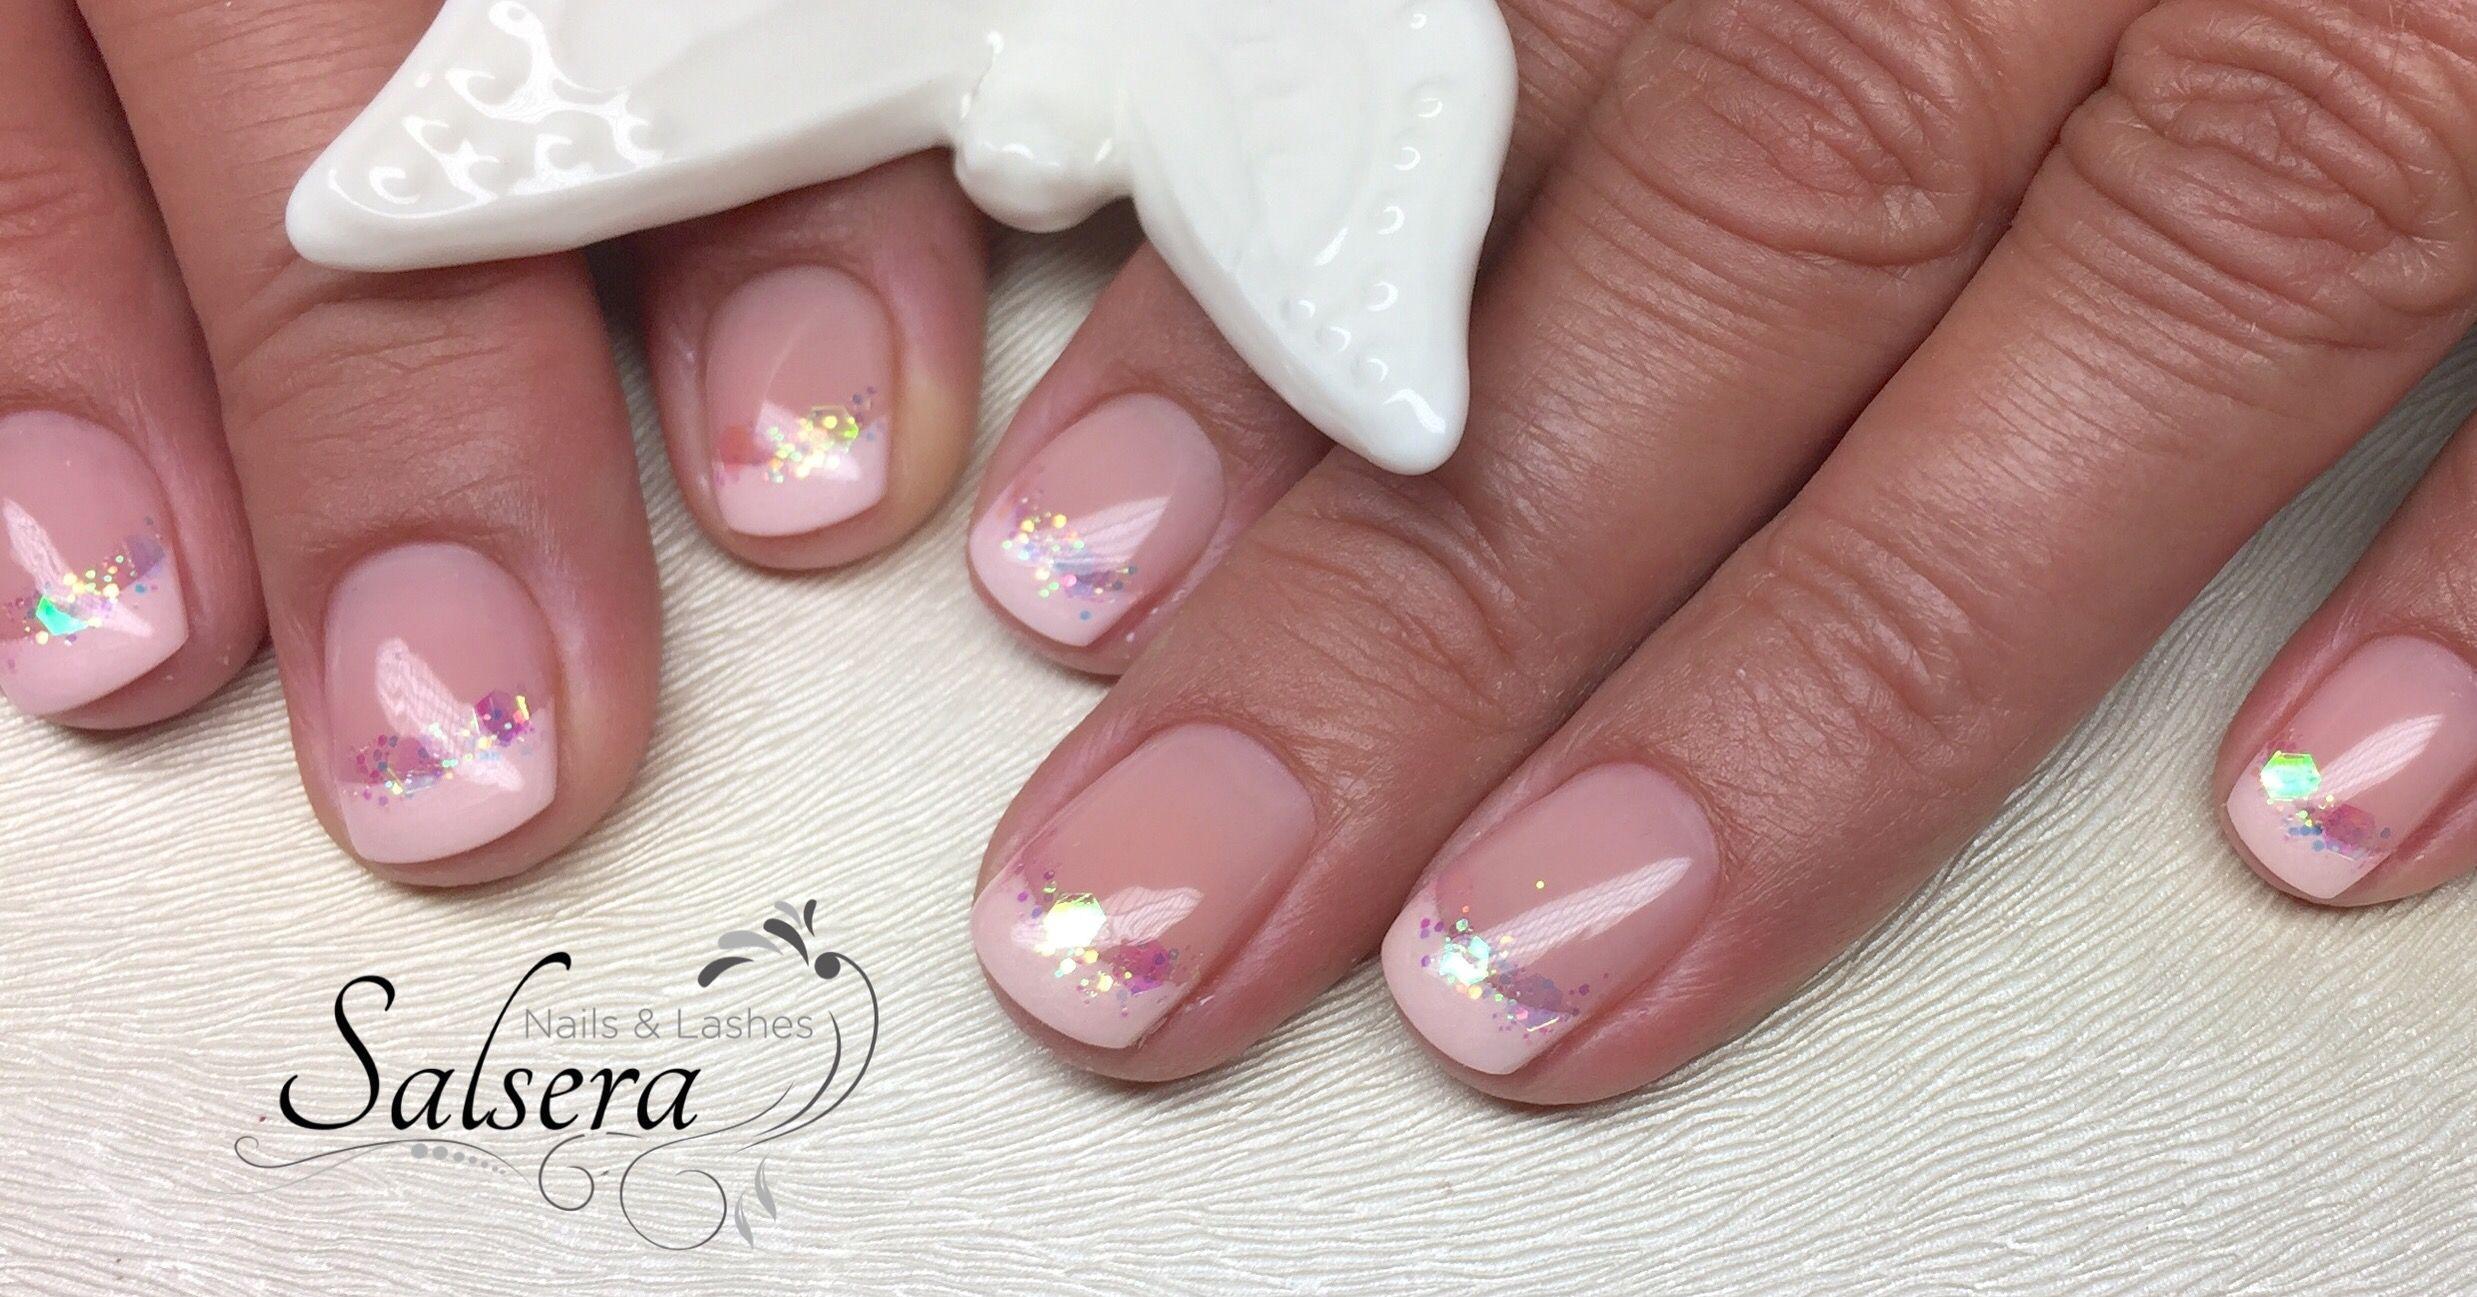 Nageldesign French Rosa  Nägel Nails Nageldesign Schöne Nägel Shortnails Rosa